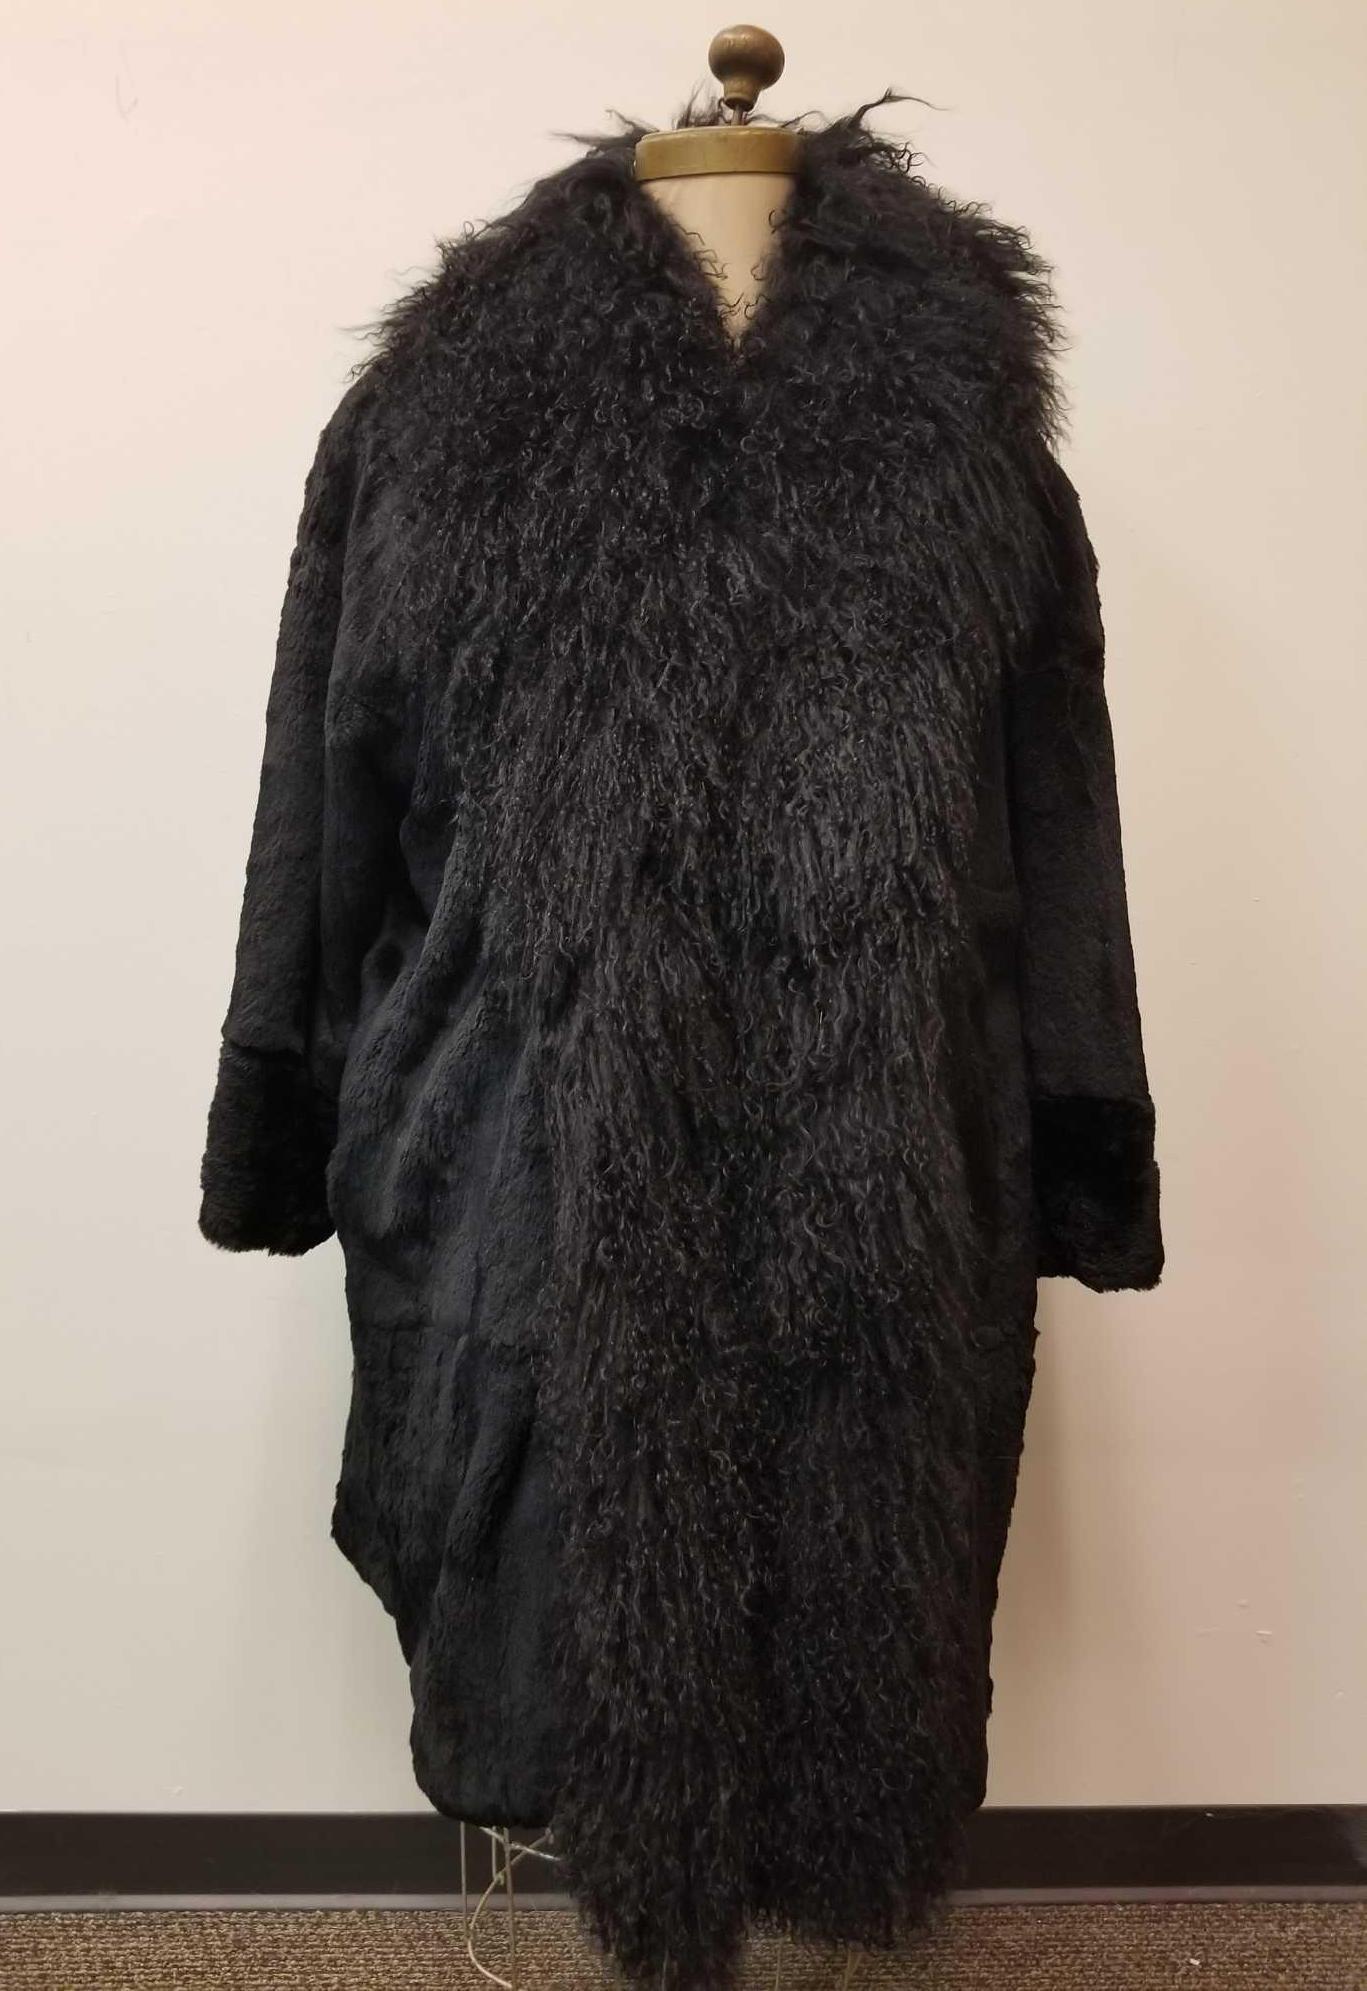 Long Black Rabbit Fur Coat with Dramatic Wool Collar